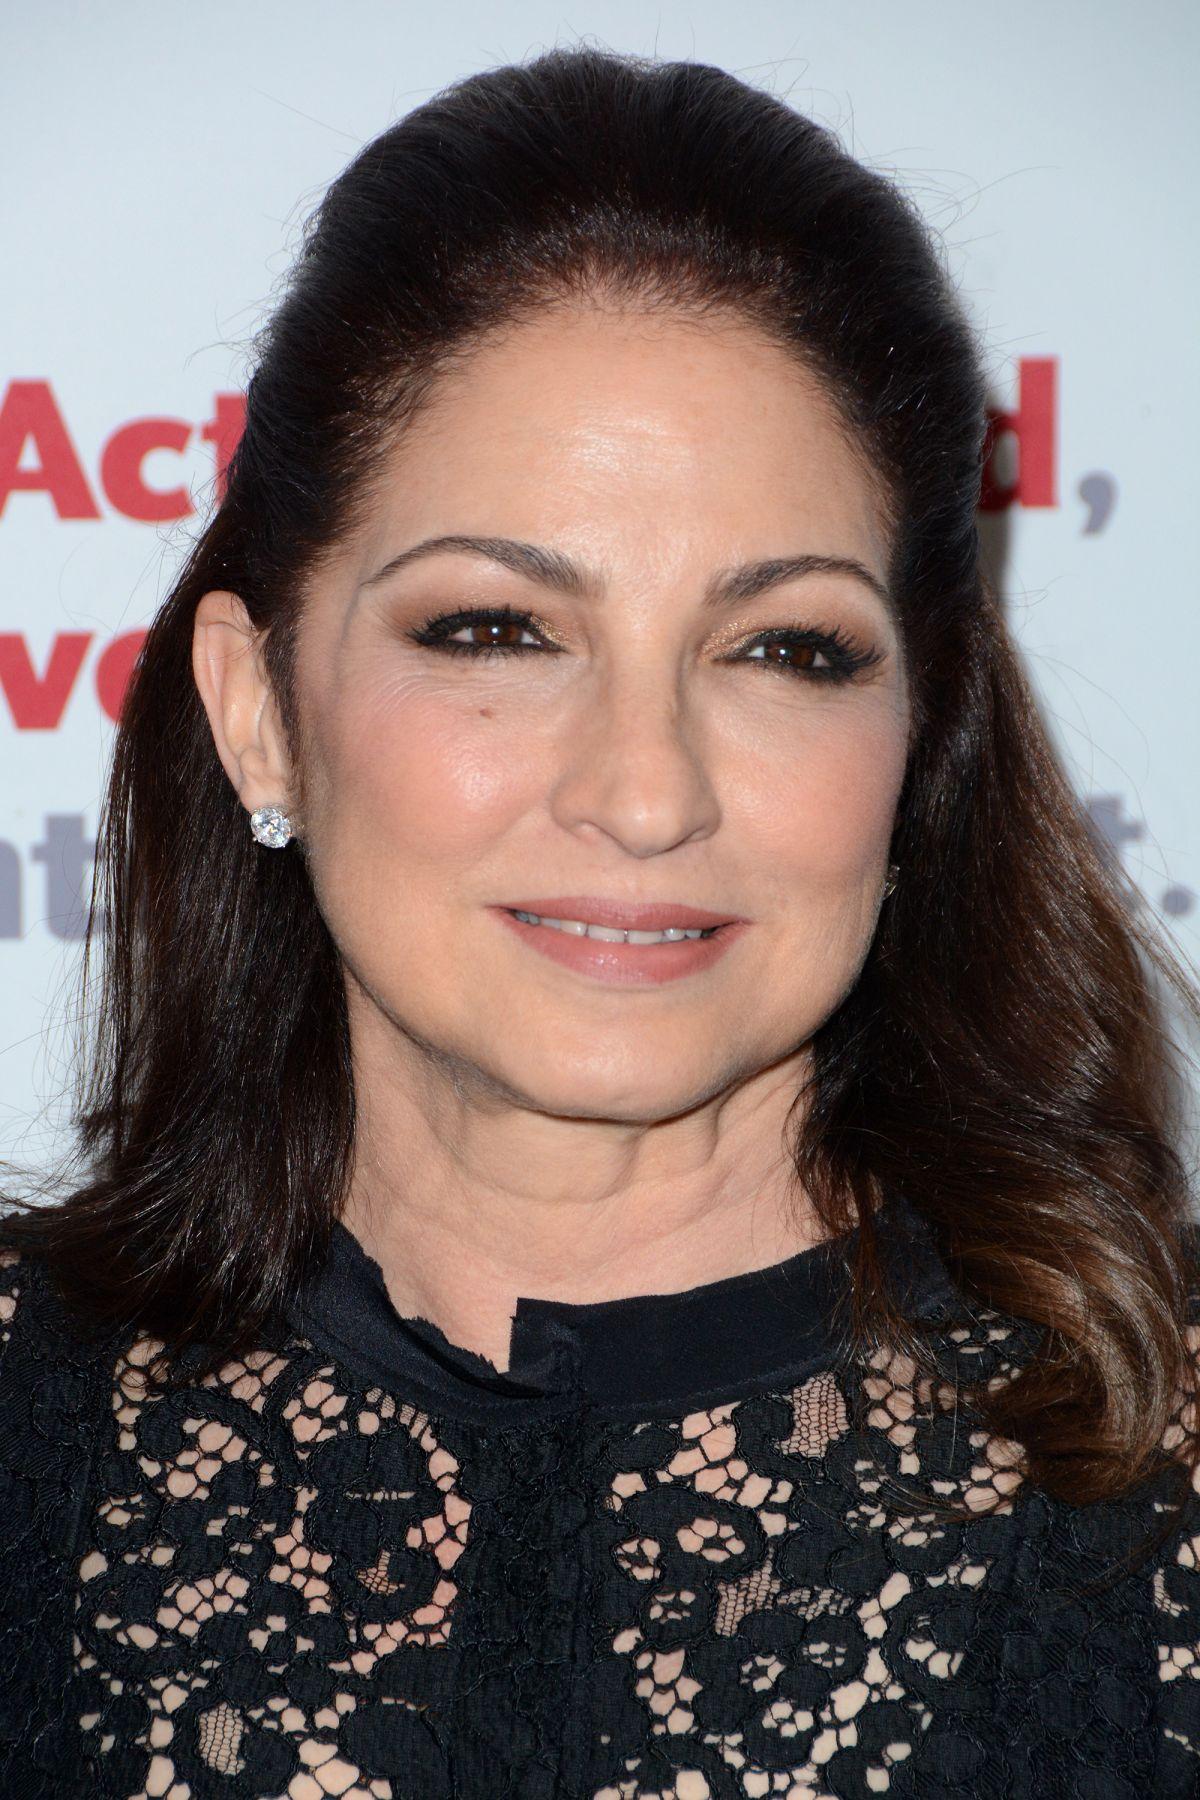 Gloria Estefan At Actors Fund 2016 Gala In New York 04 25